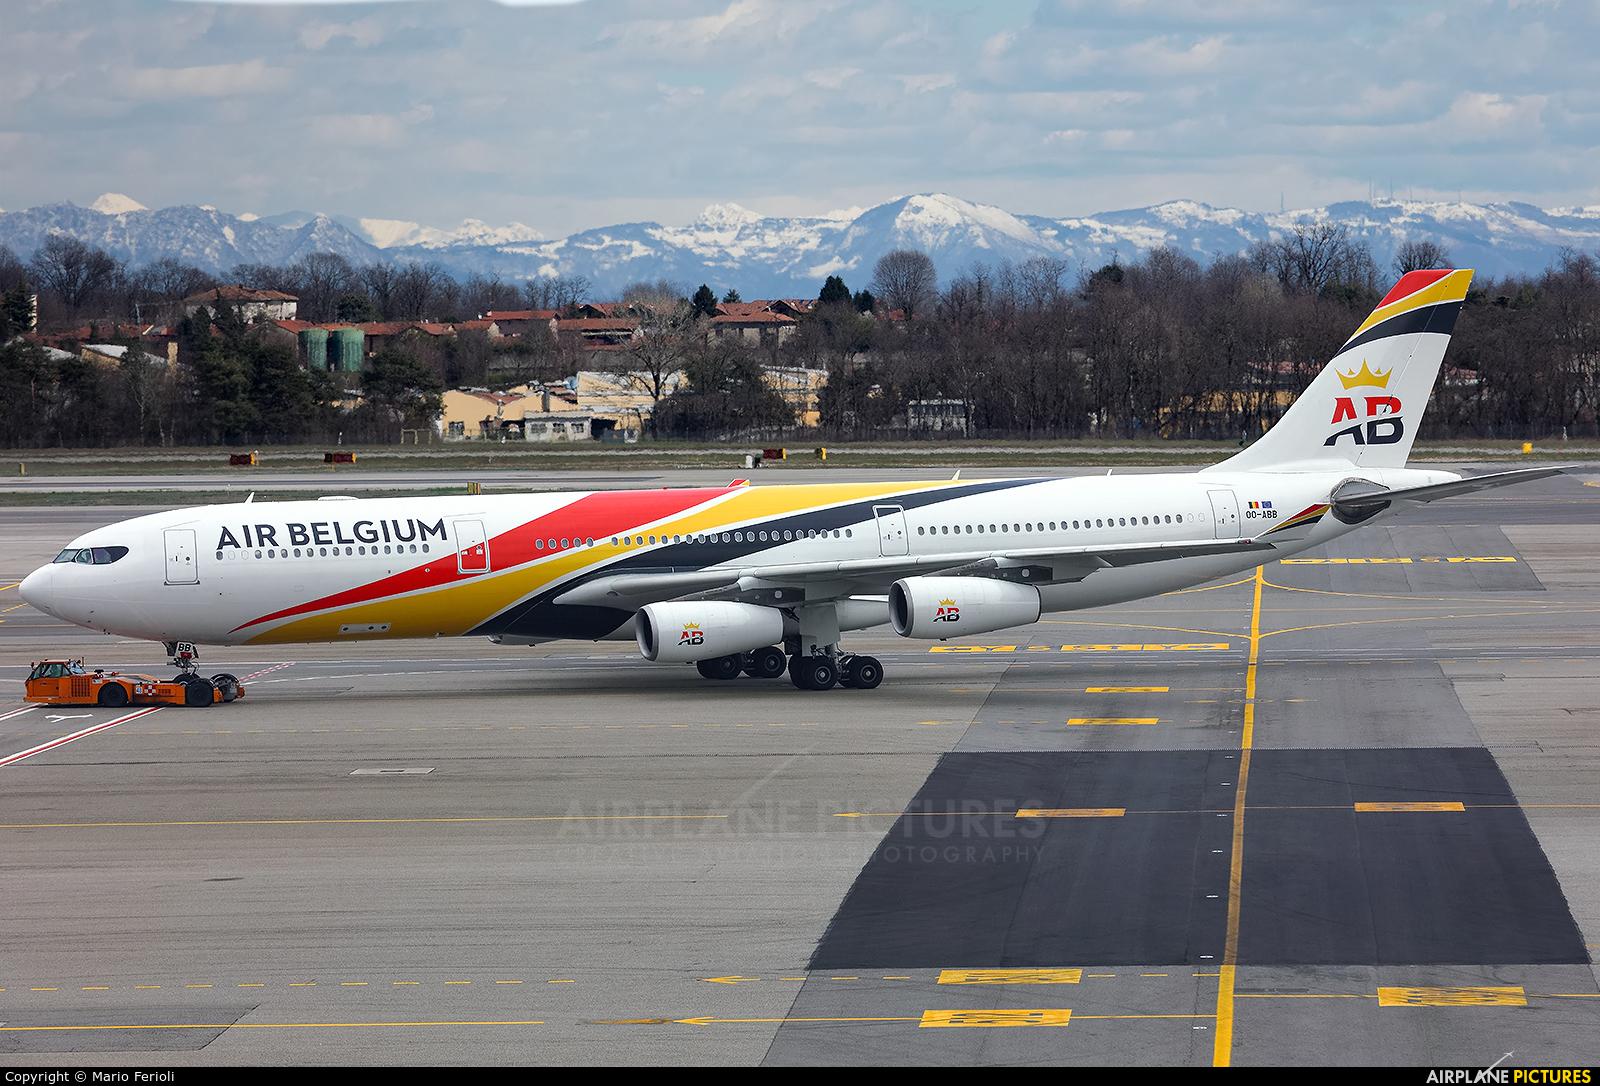 Air Belgium OO-ABB aircraft at Milan - Malpensa